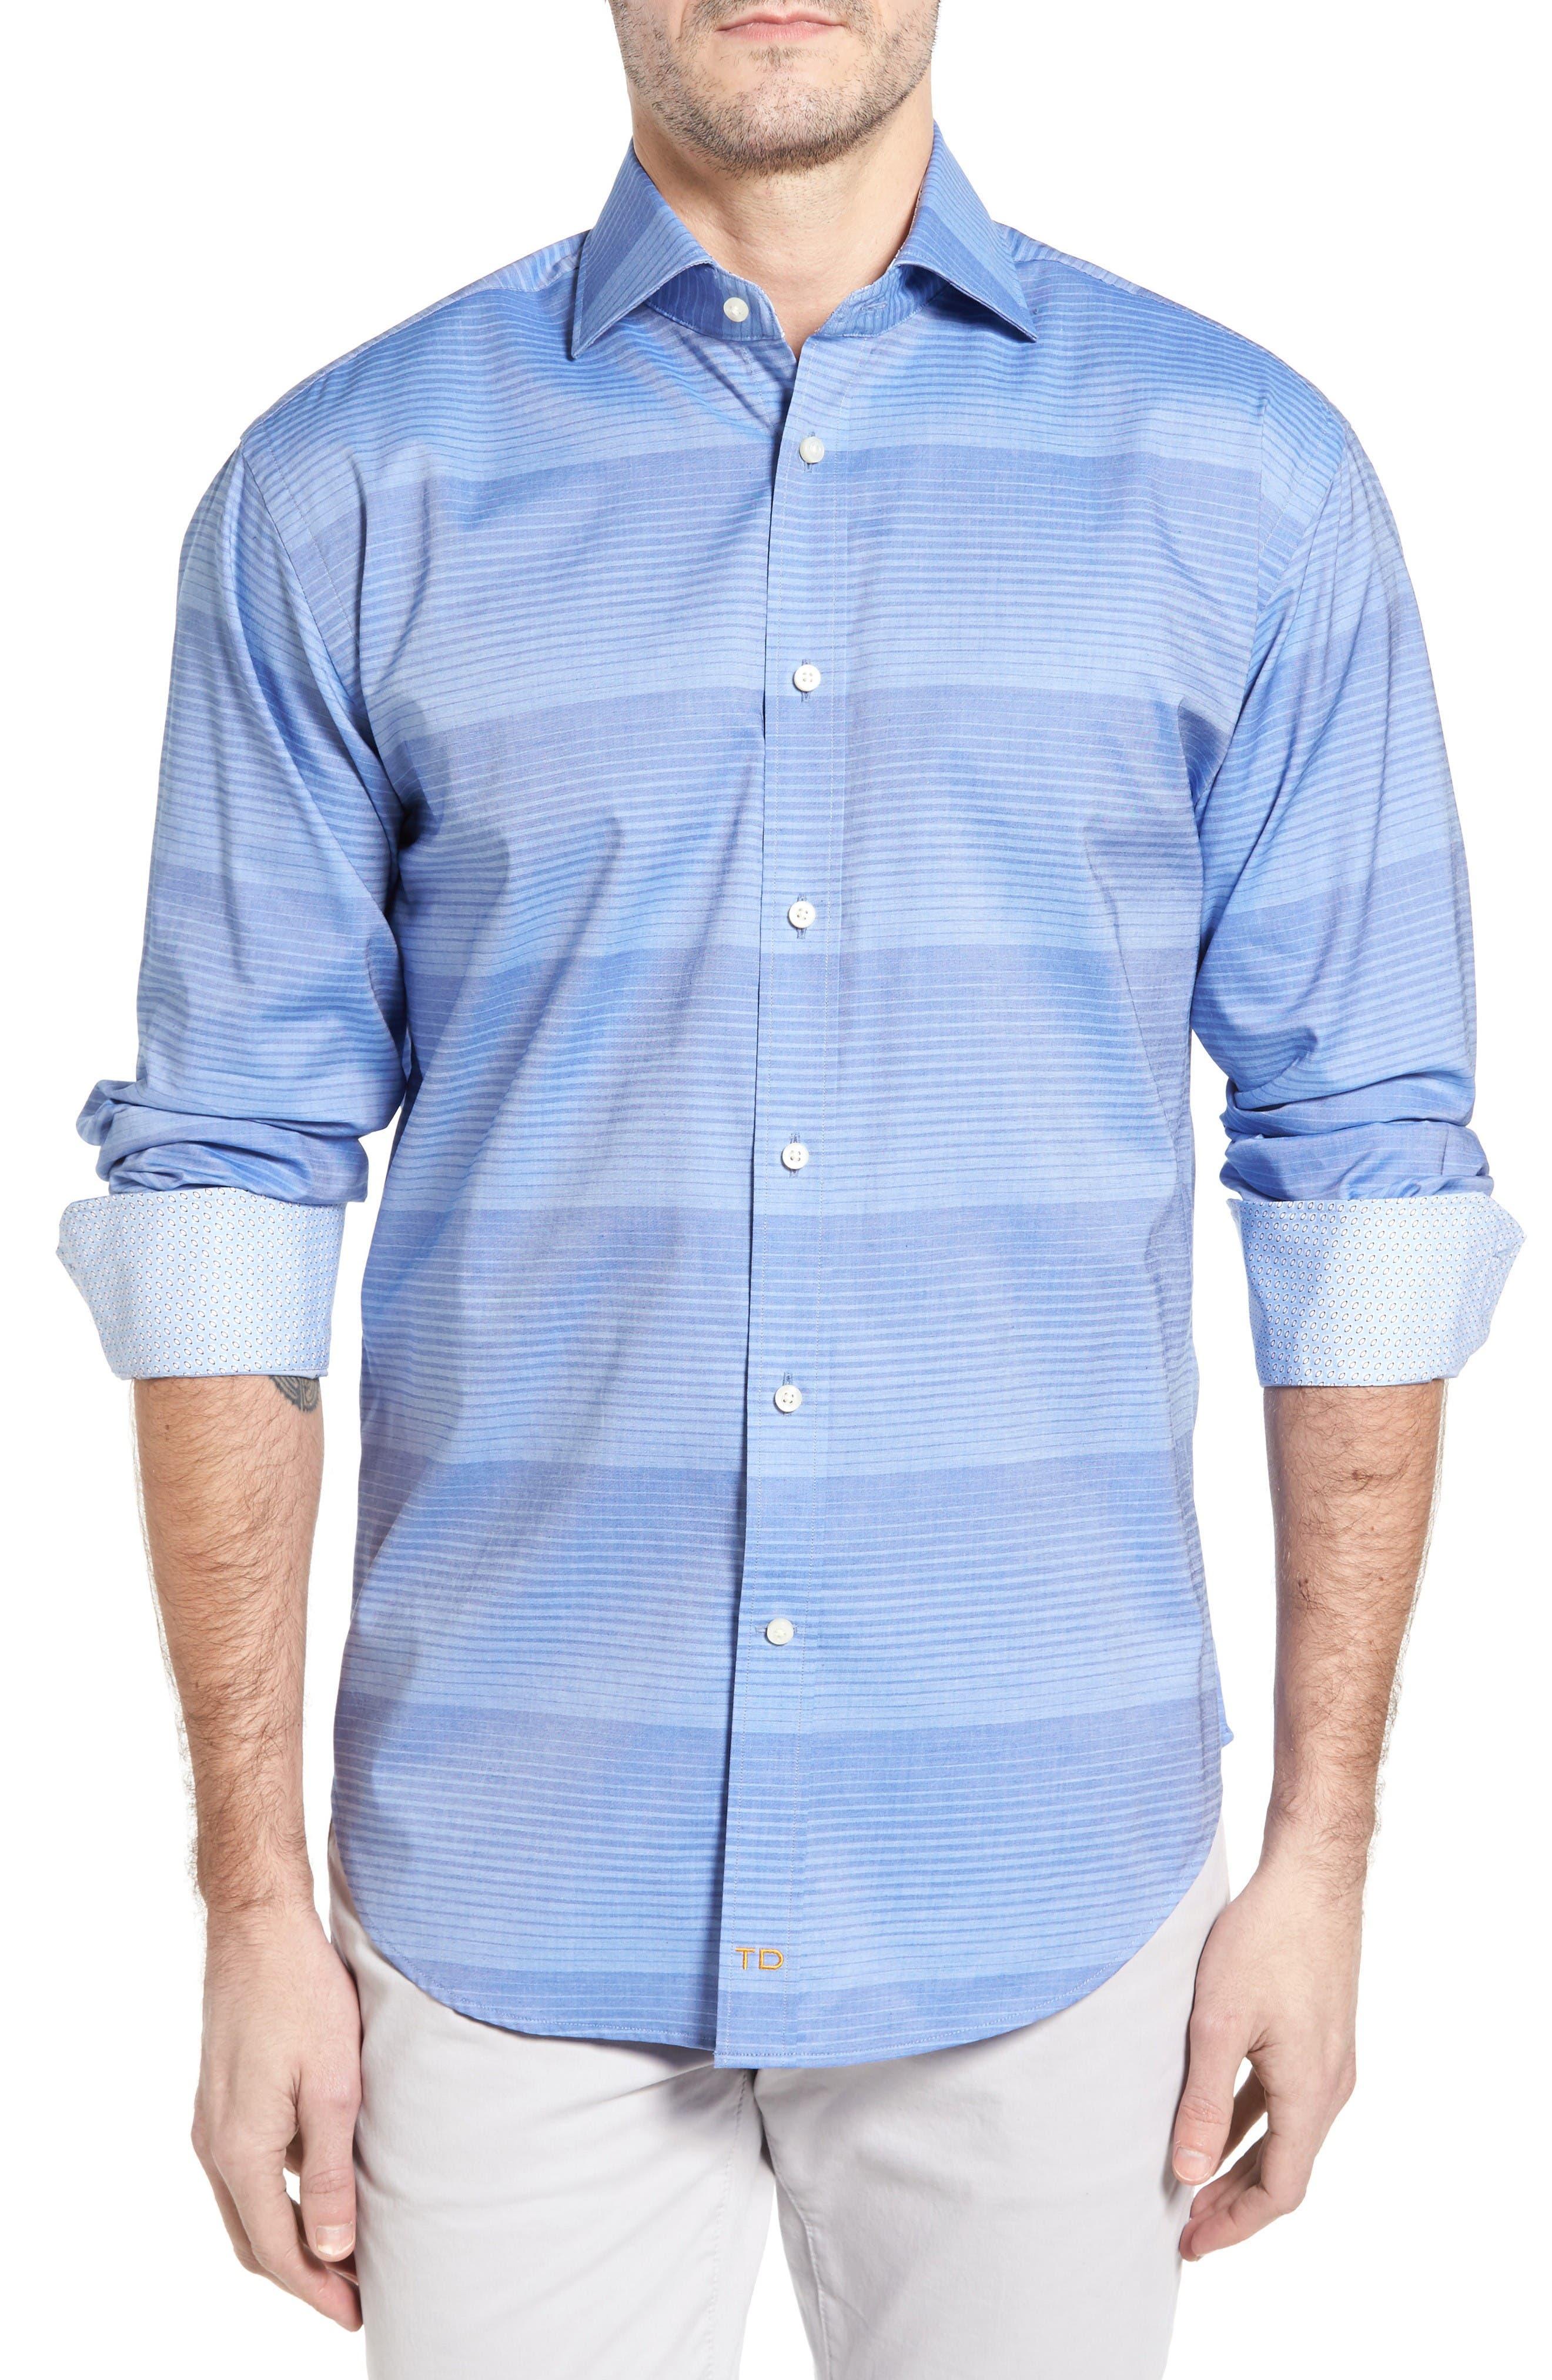 Alternate Image 1 Selected - Thomas Dean Classic Fit Graduated Stripe Sport Shirt